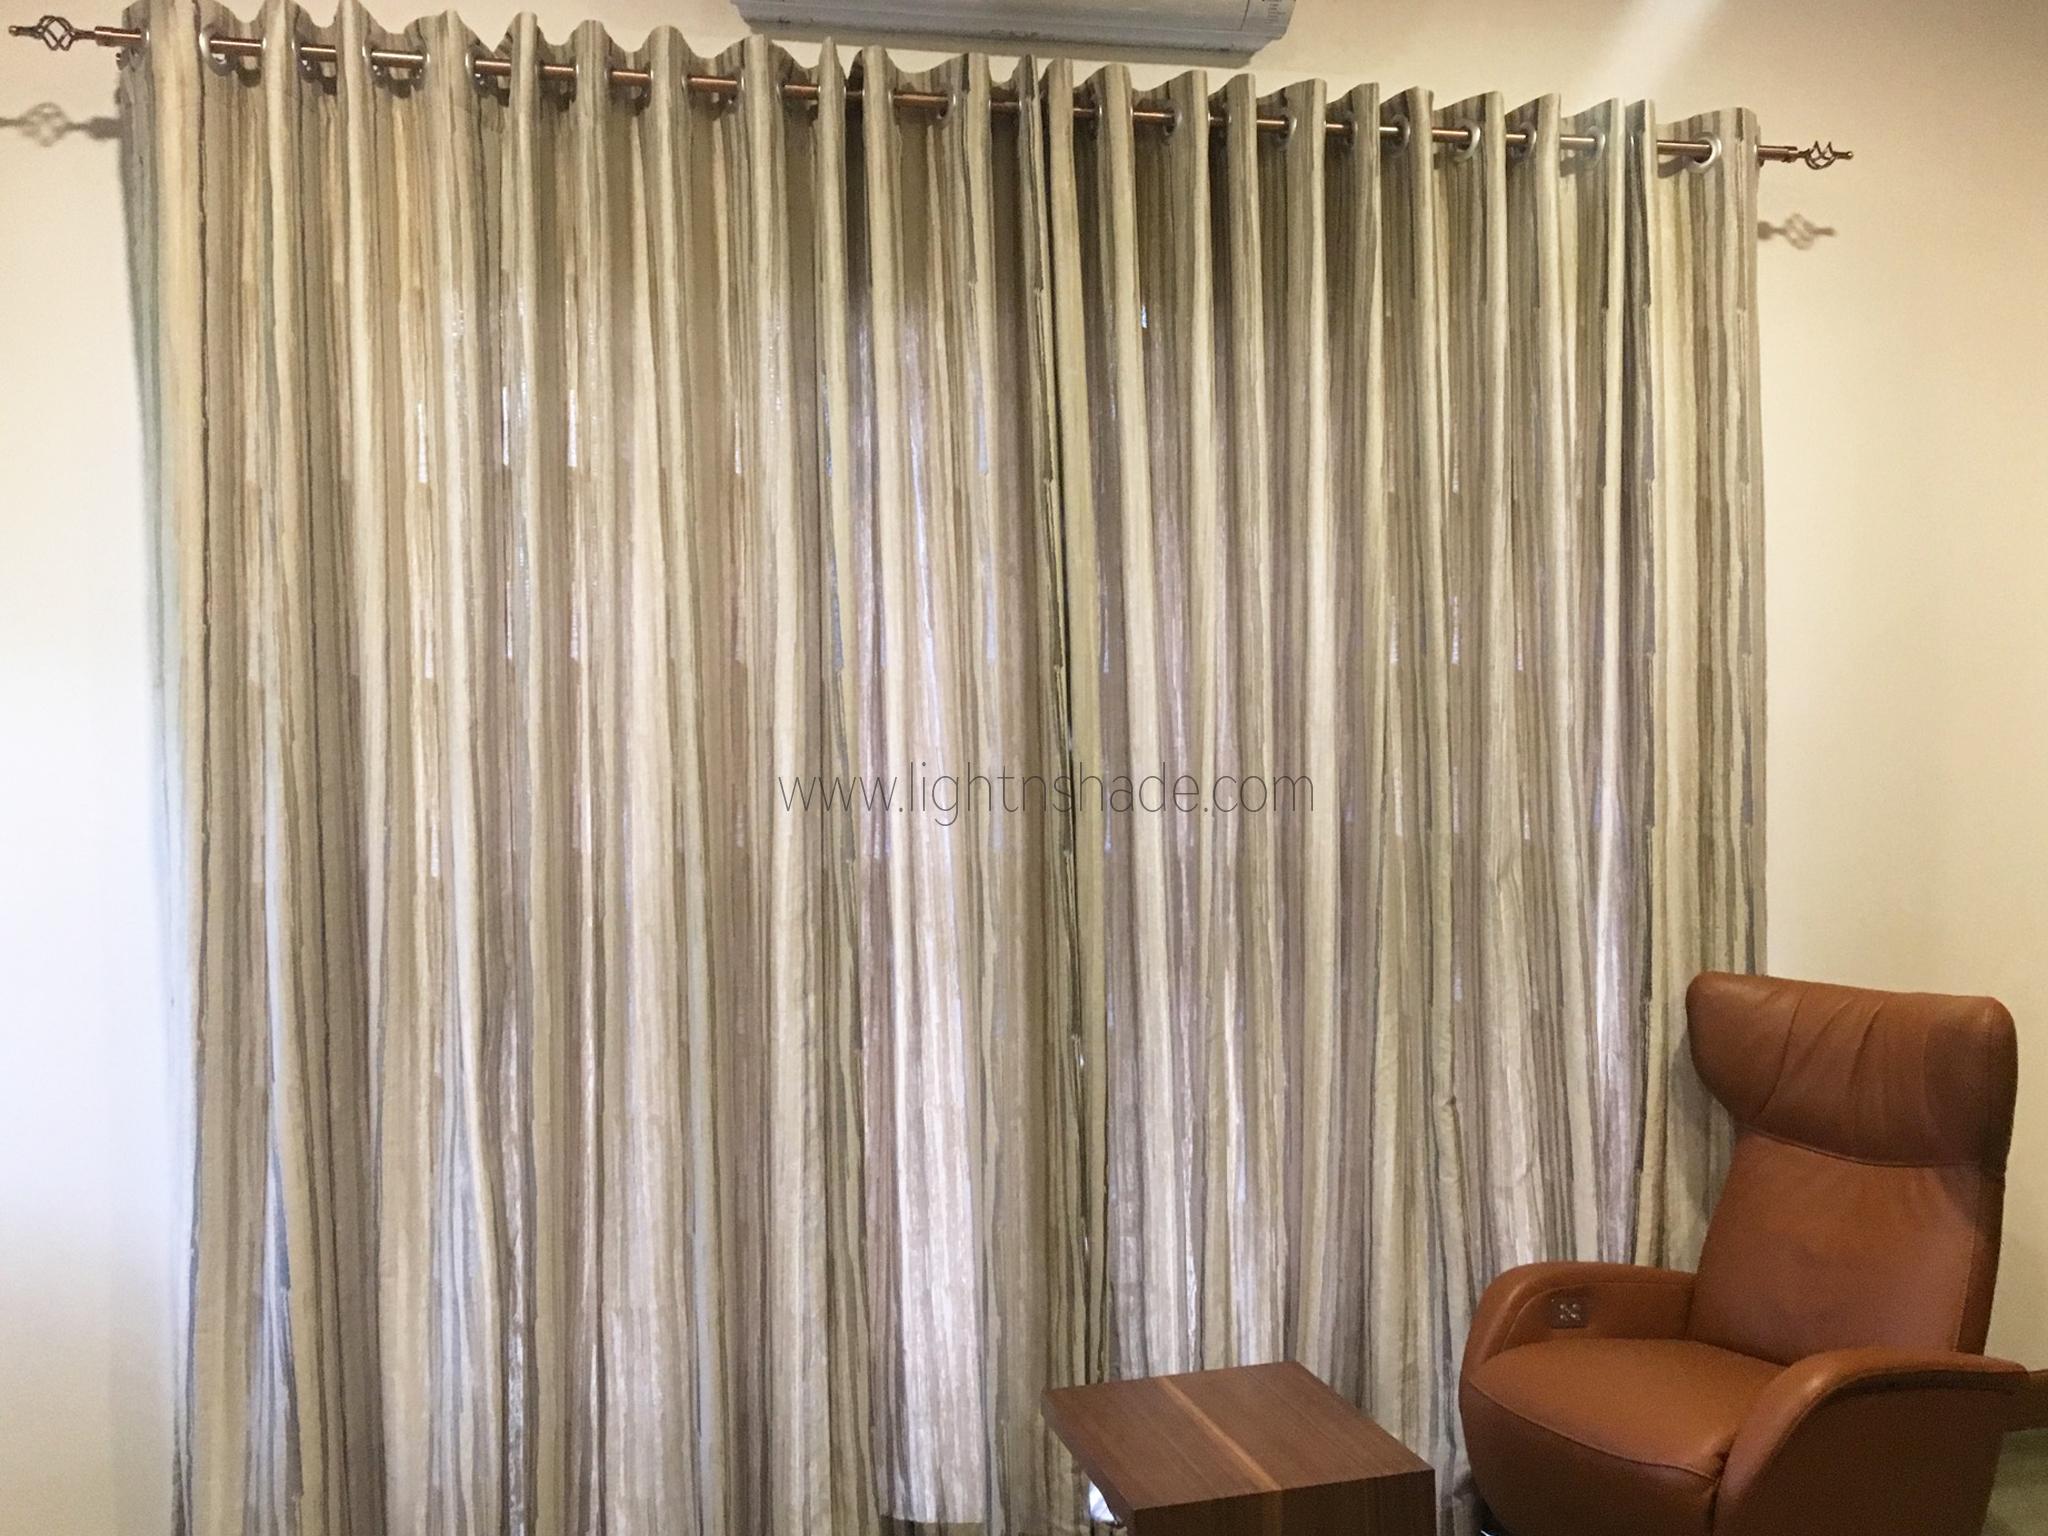 shade sri lanka curtains and blinds